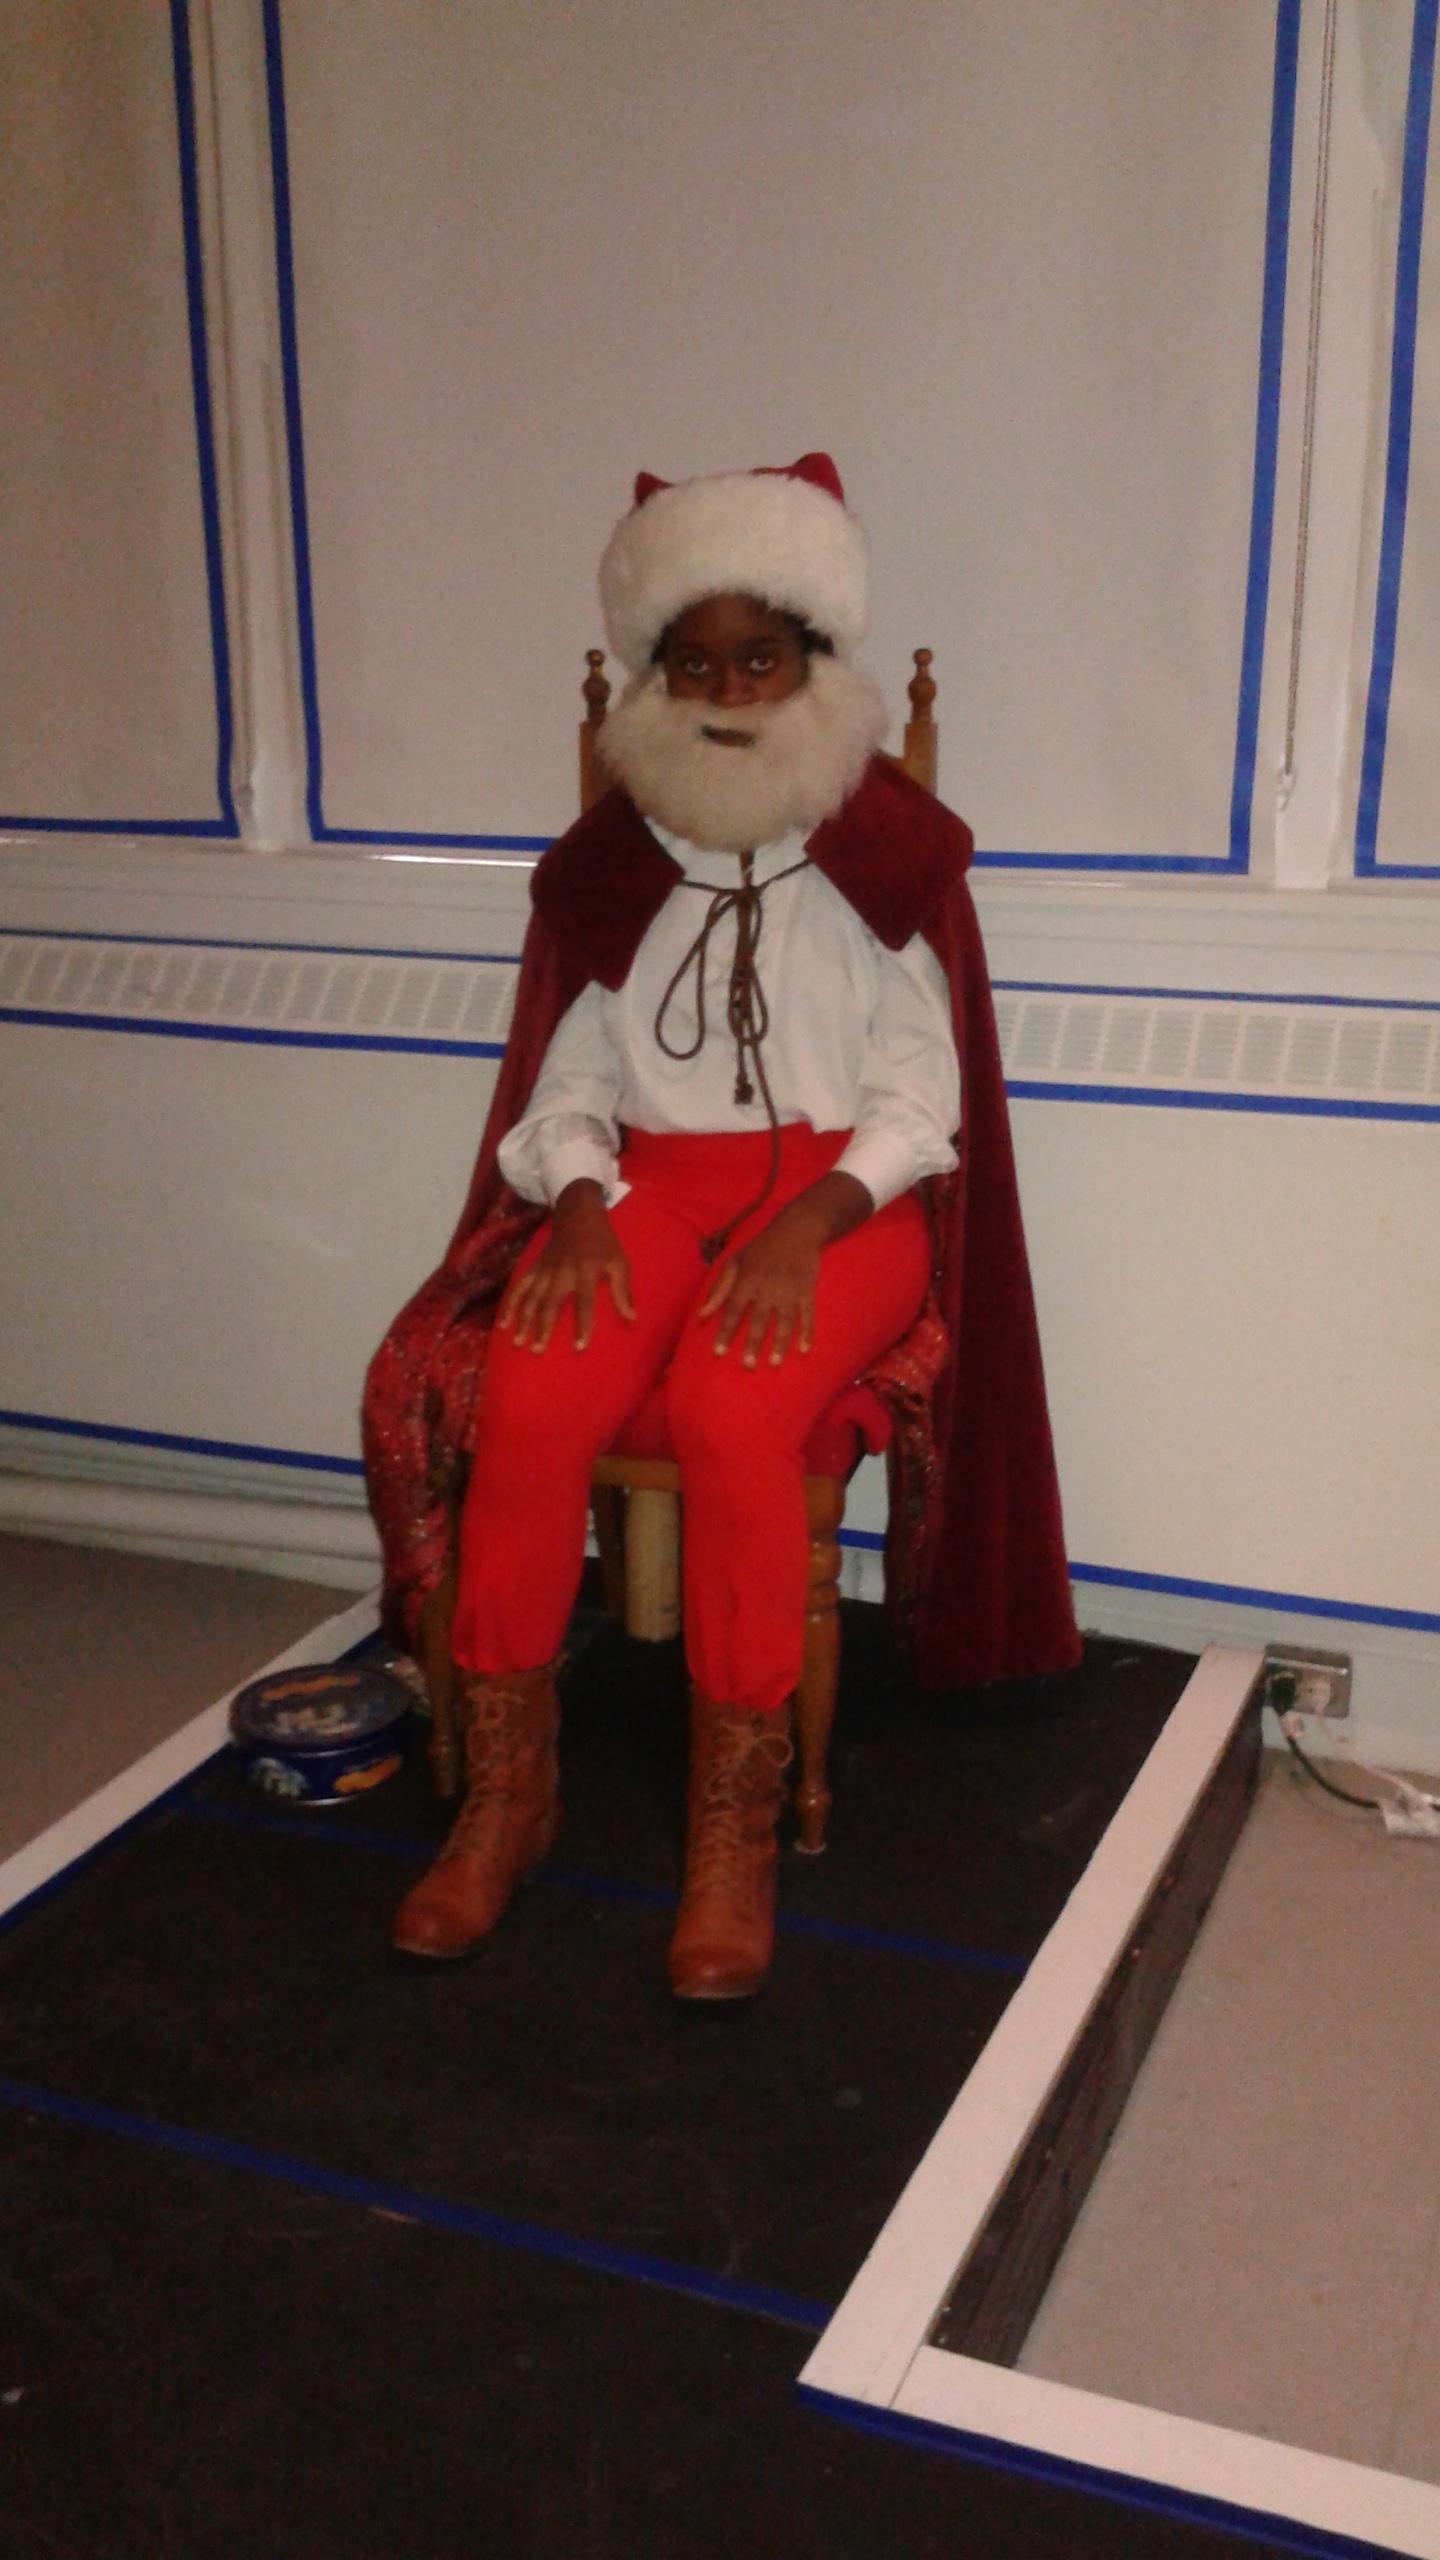 Jajube Mandiela as Santa Claus